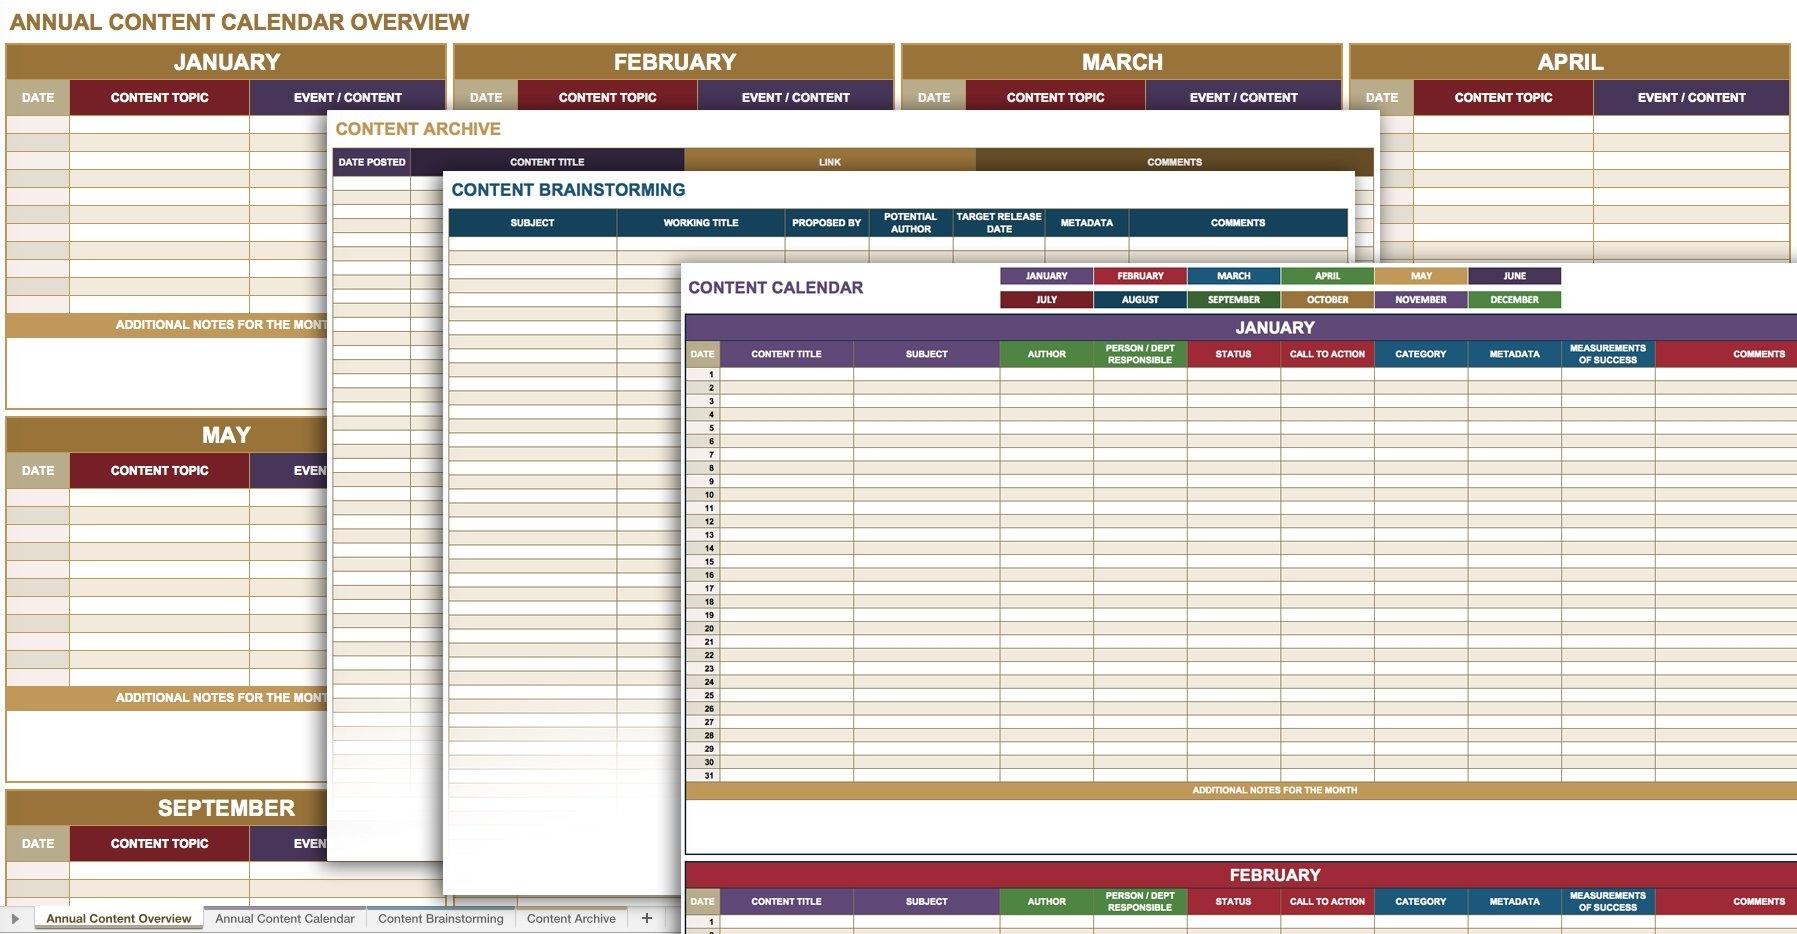 12 Free Social Media Templates | Smartsheet in Social Media Content Calendar Excel Template Free